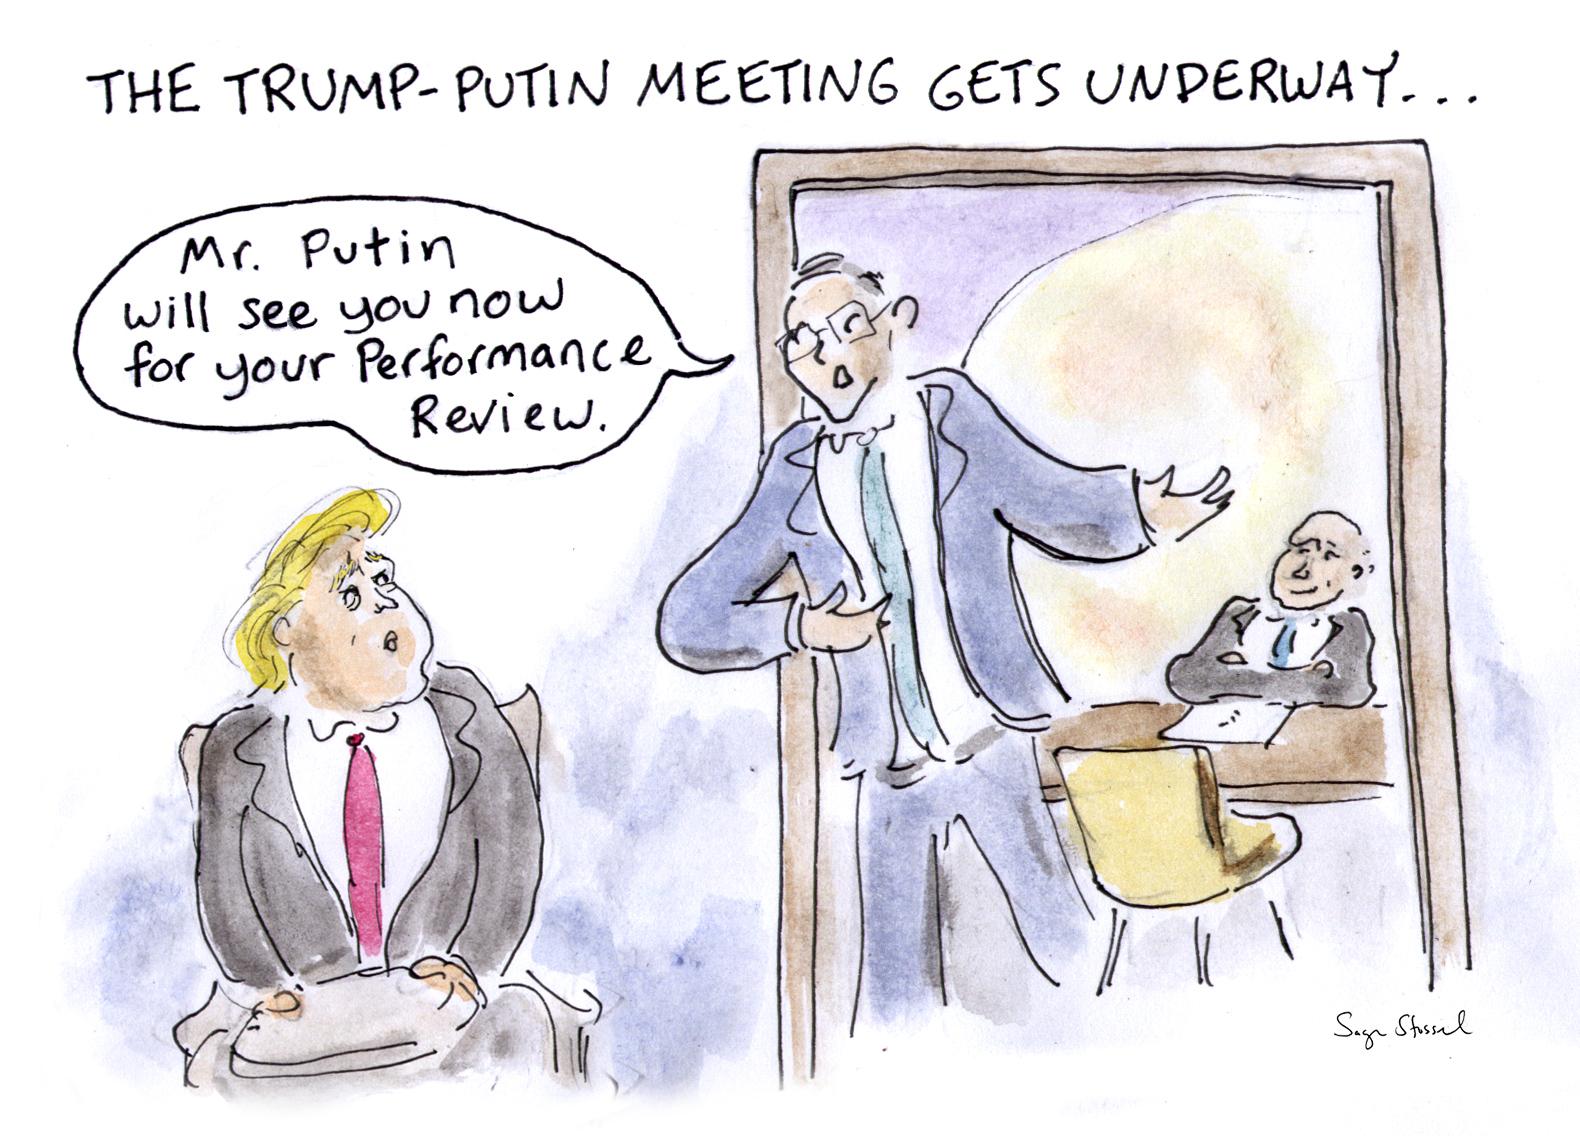 g20, trump, putin meeting, hamburg, germany, cartoon